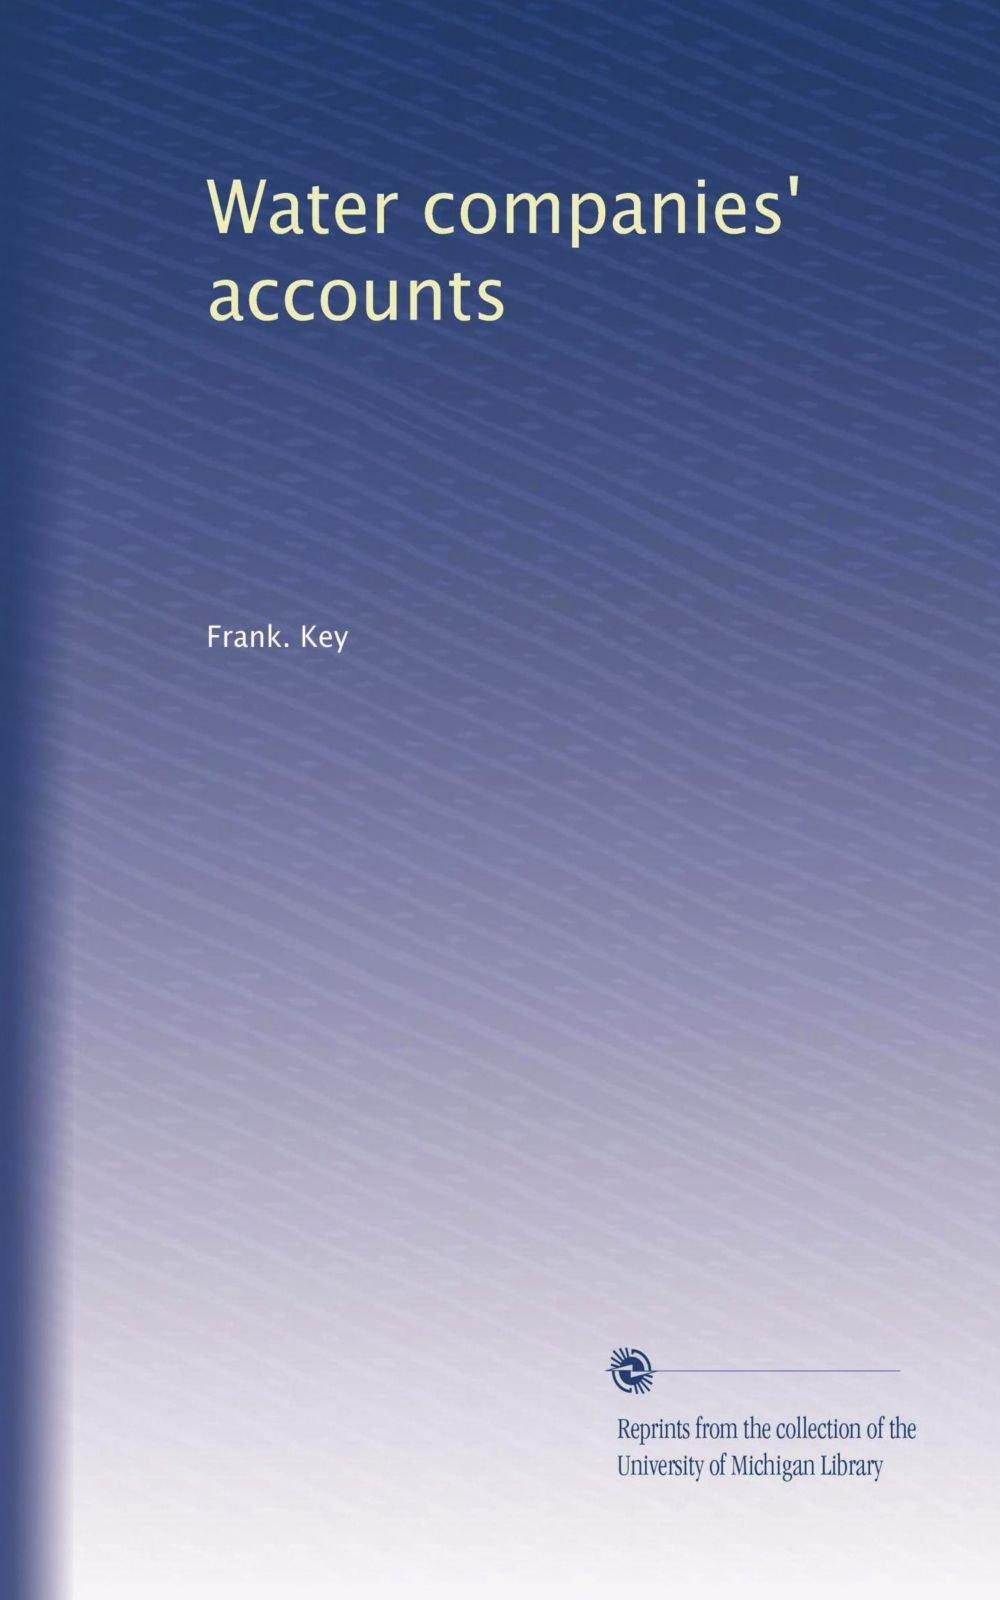 Download Water companies' accounts ebook